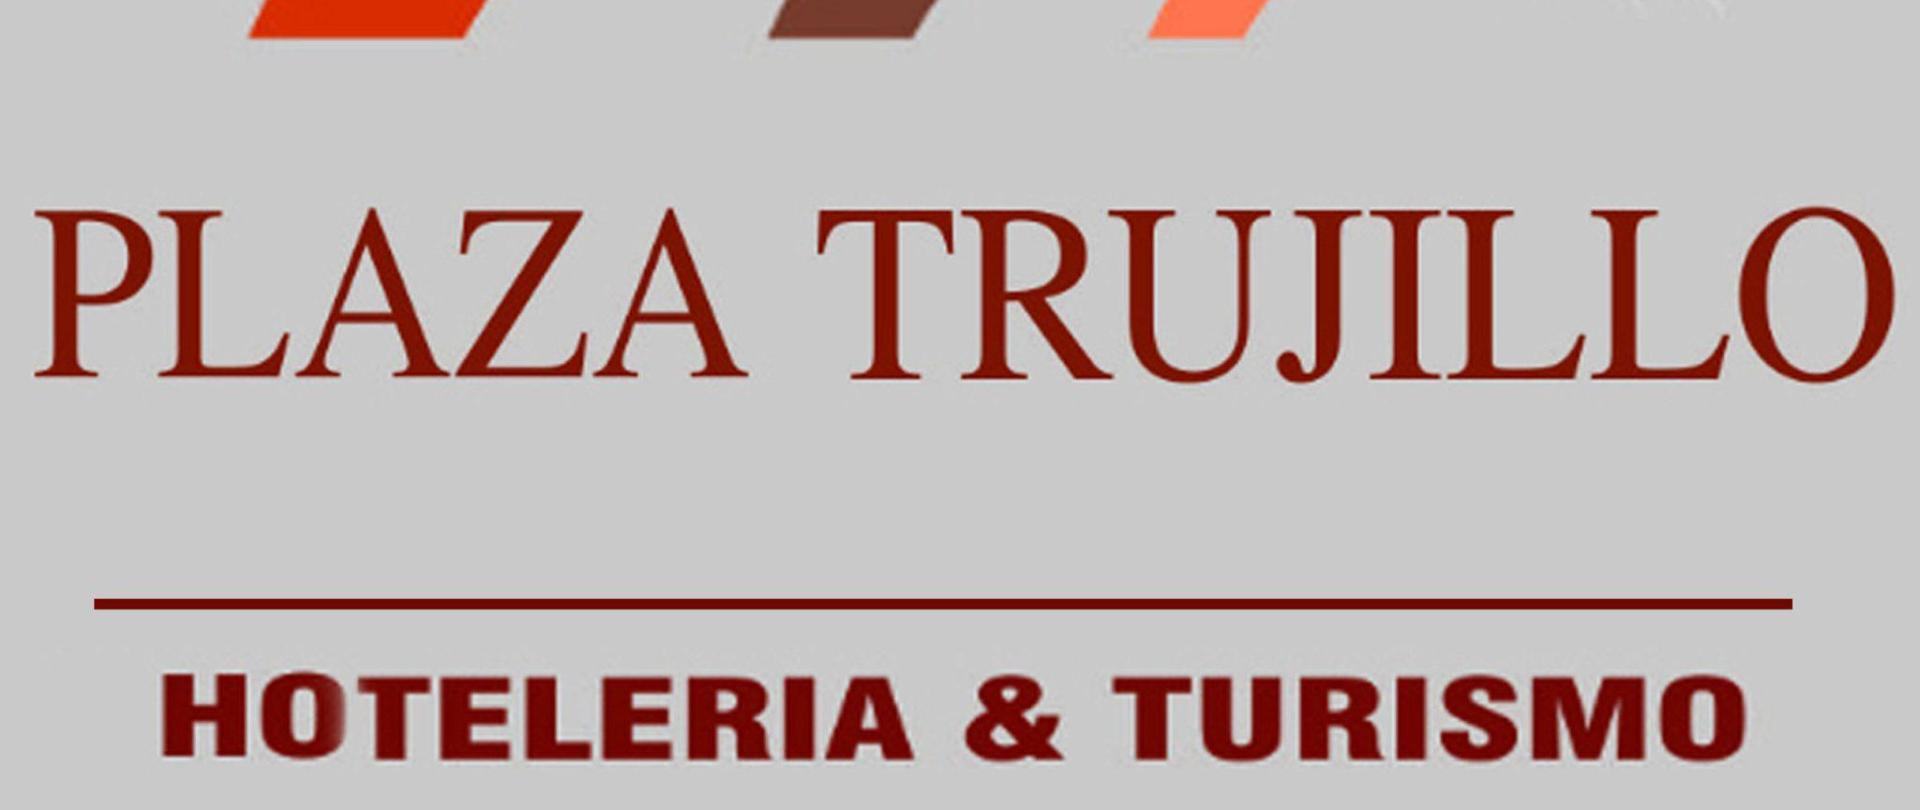 logo-facebook-hoteleria-y-turismo.jpg